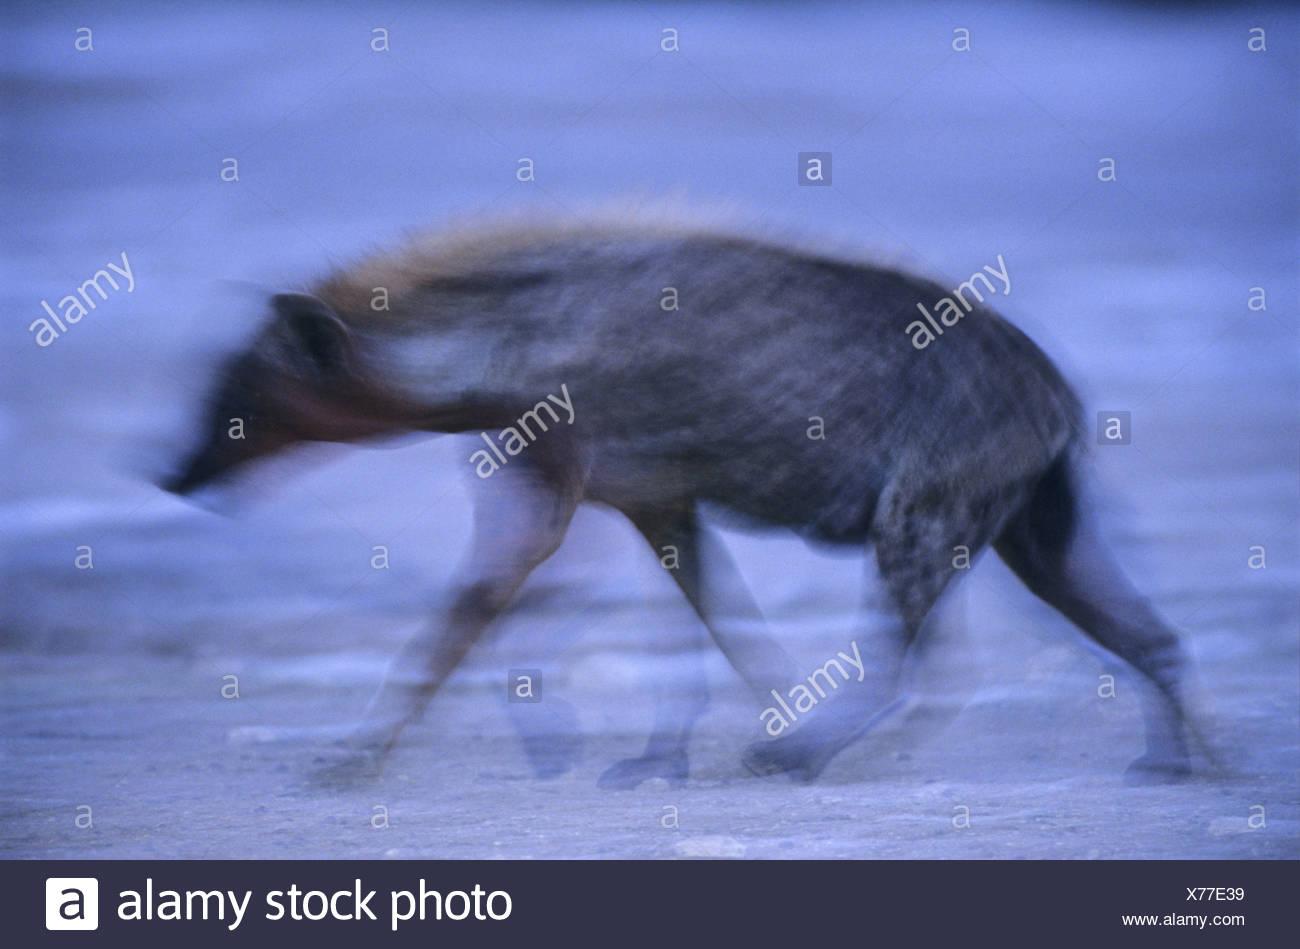 spotted hyena (Crocuta crocuta), ambiguous, Namibia, Namotoni - Stock Image